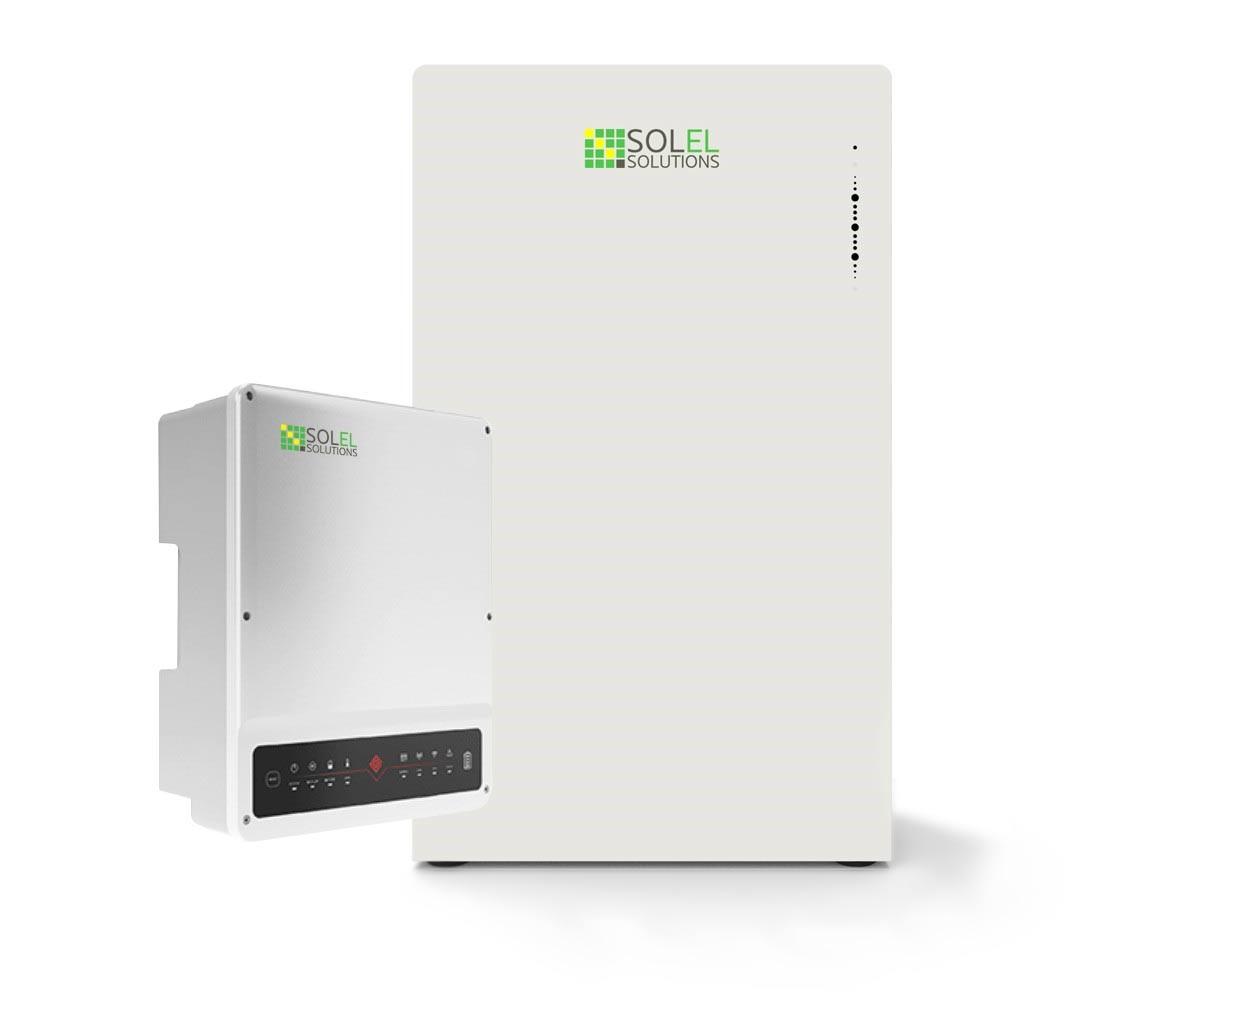 Solel Solutions - Energilagringspaket - 10 kW retrofit växelriktare och 12,5 kWh energilager